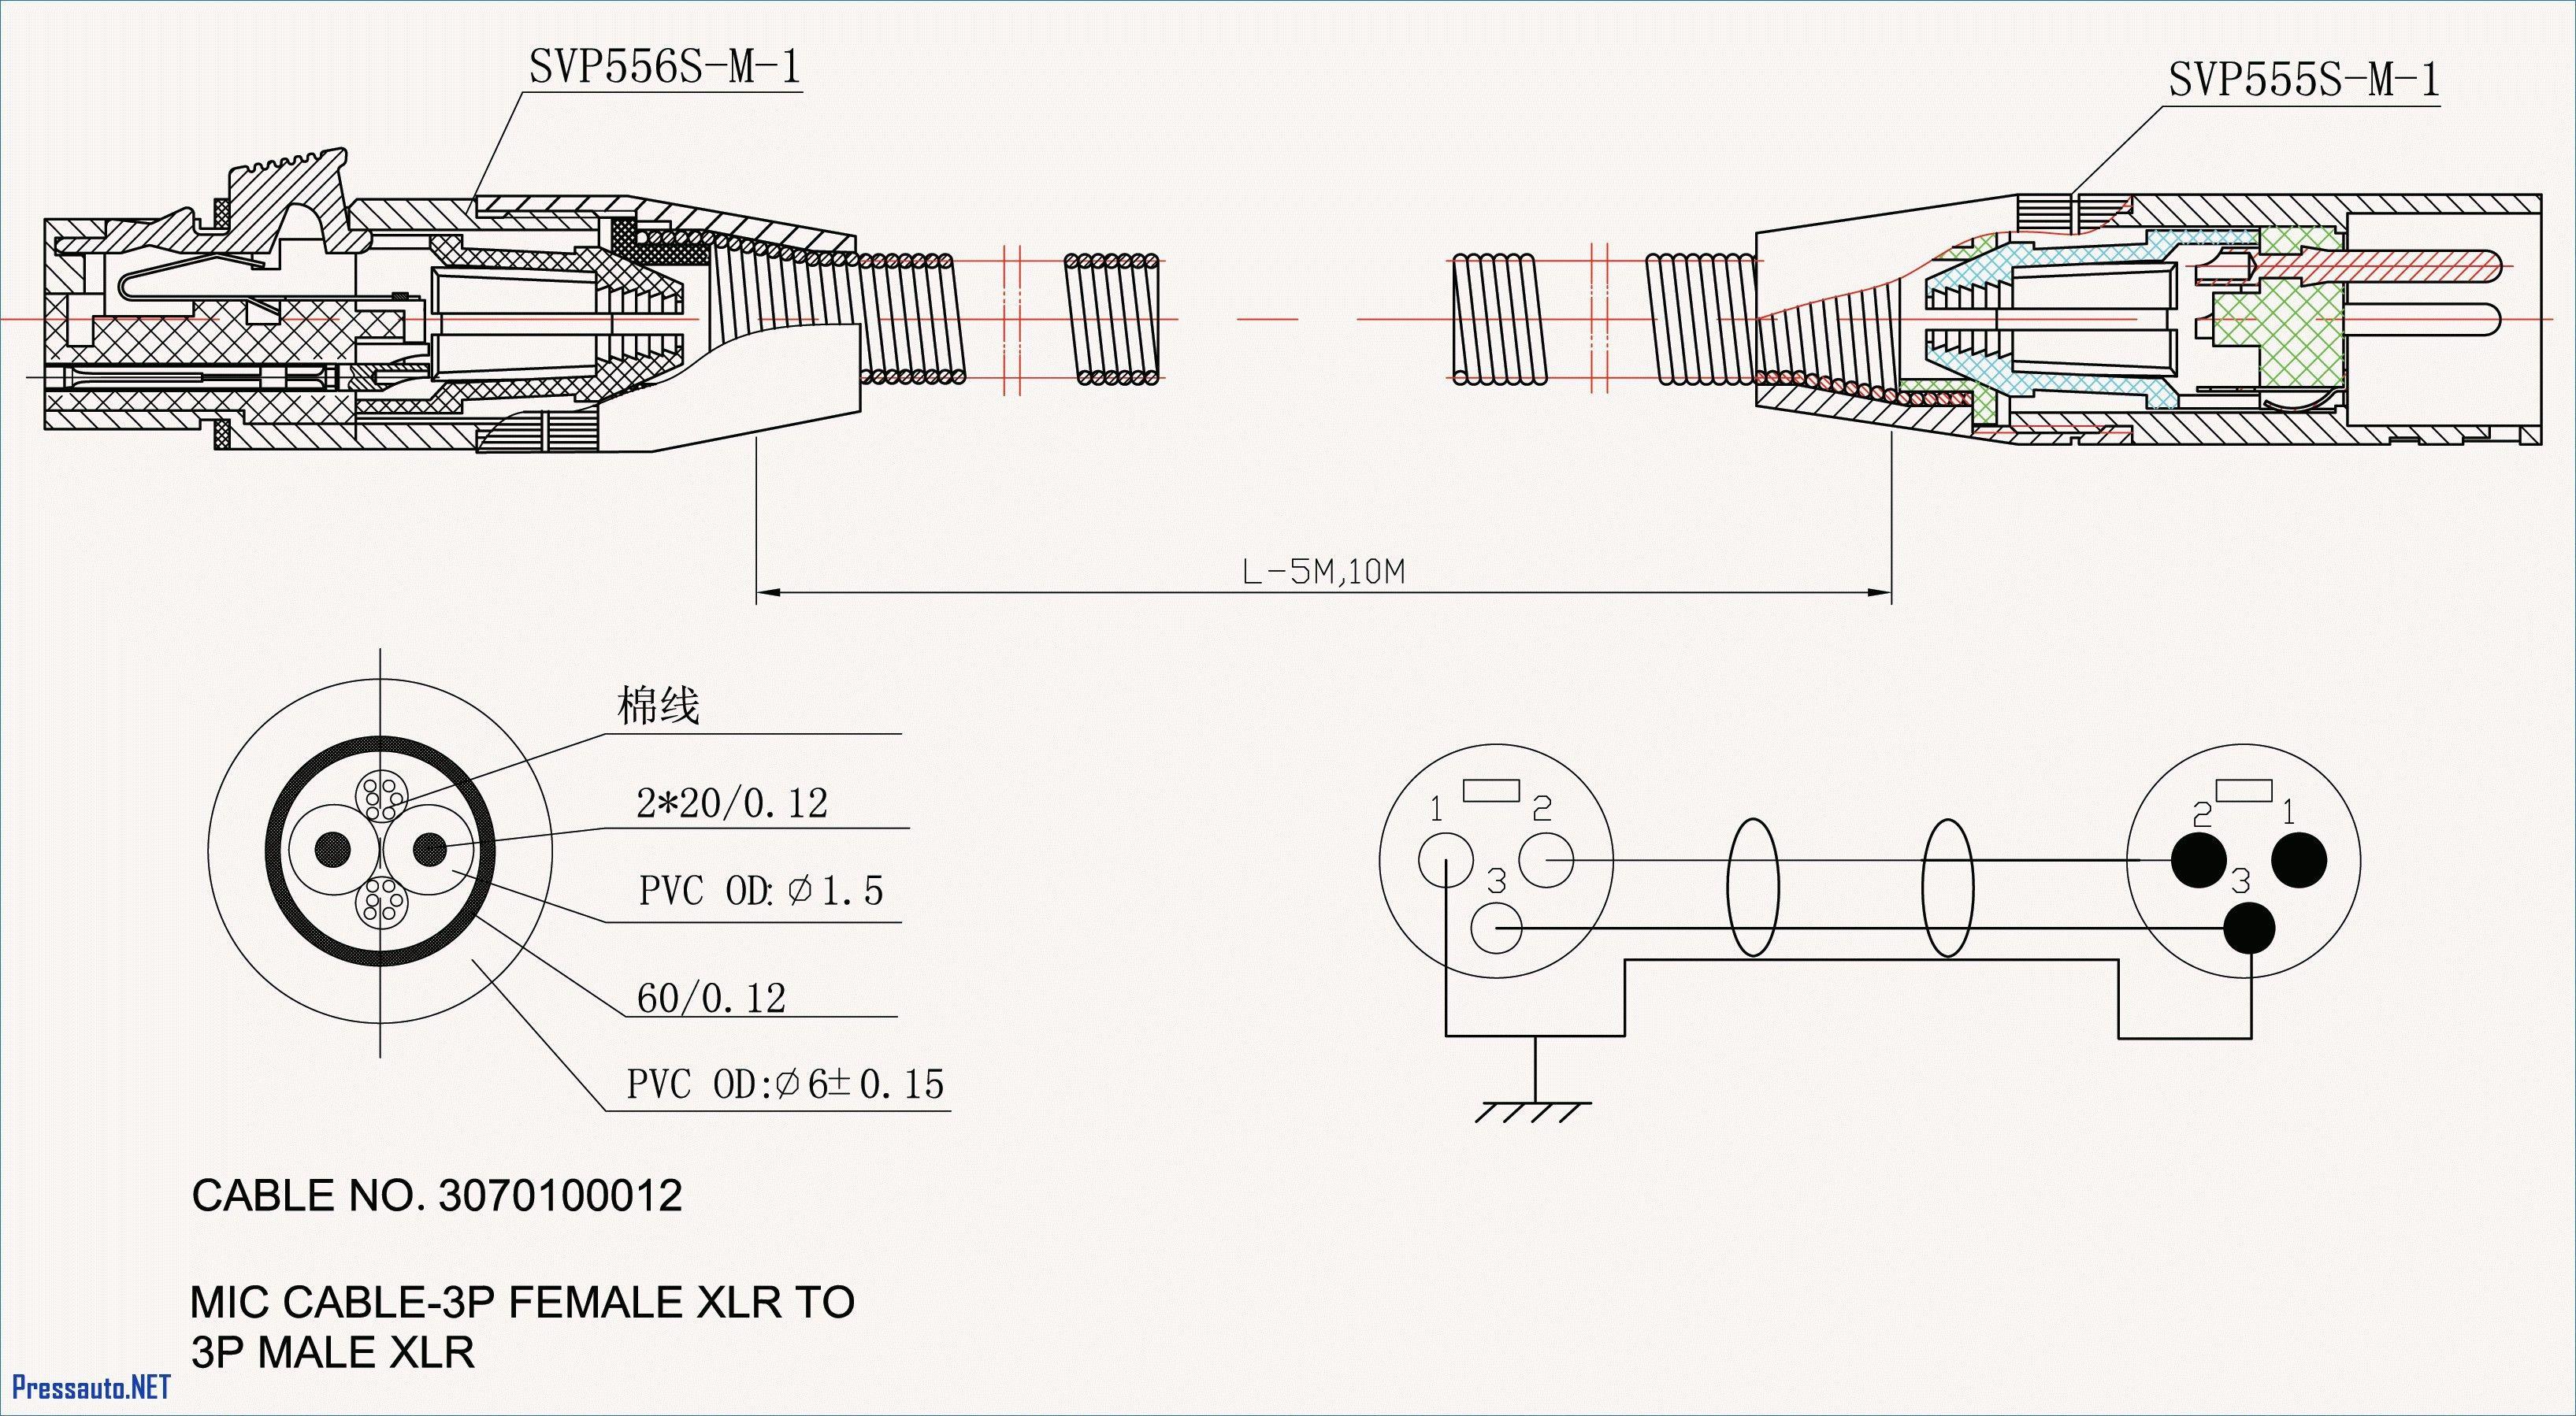 Unique Skytronics Alternator Wiring Diagram Diagrams Digramssample Diagramimages Check More At Htt Electrical Wiring Diagram Door Repair Garage Service Door